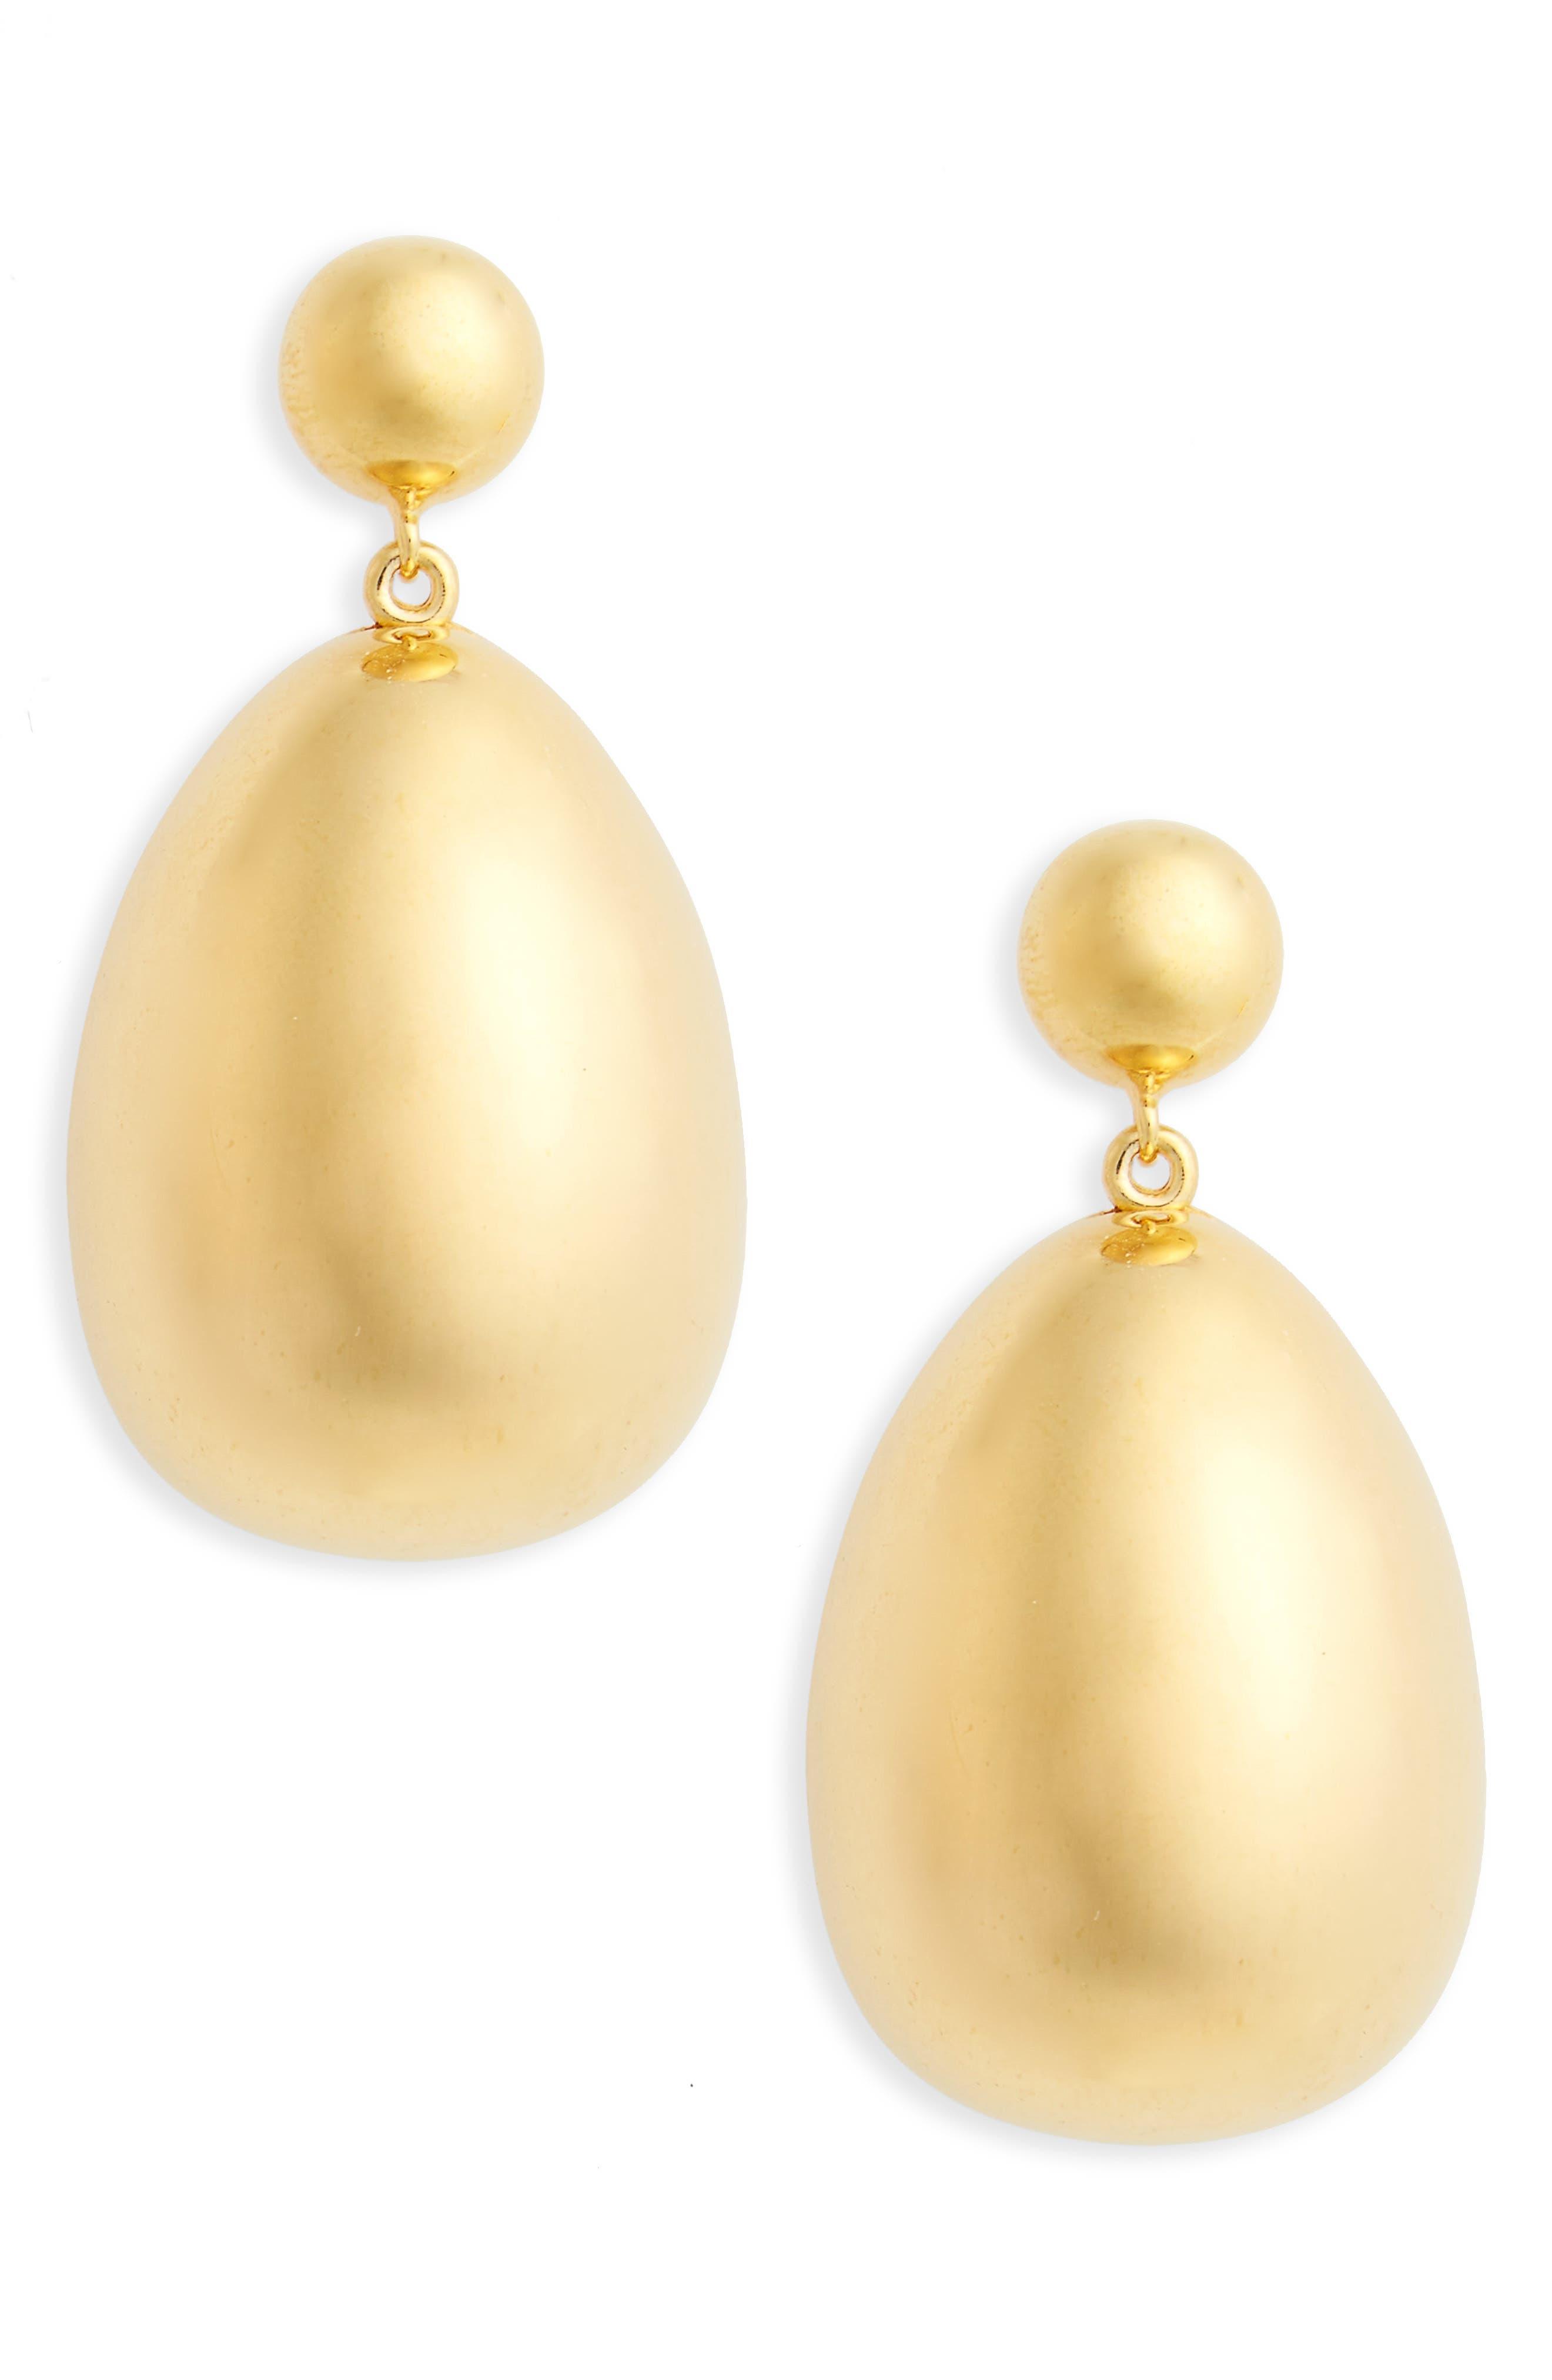 Vermeil Egg Drop Earrings,                         Main,                         color, Vermeill